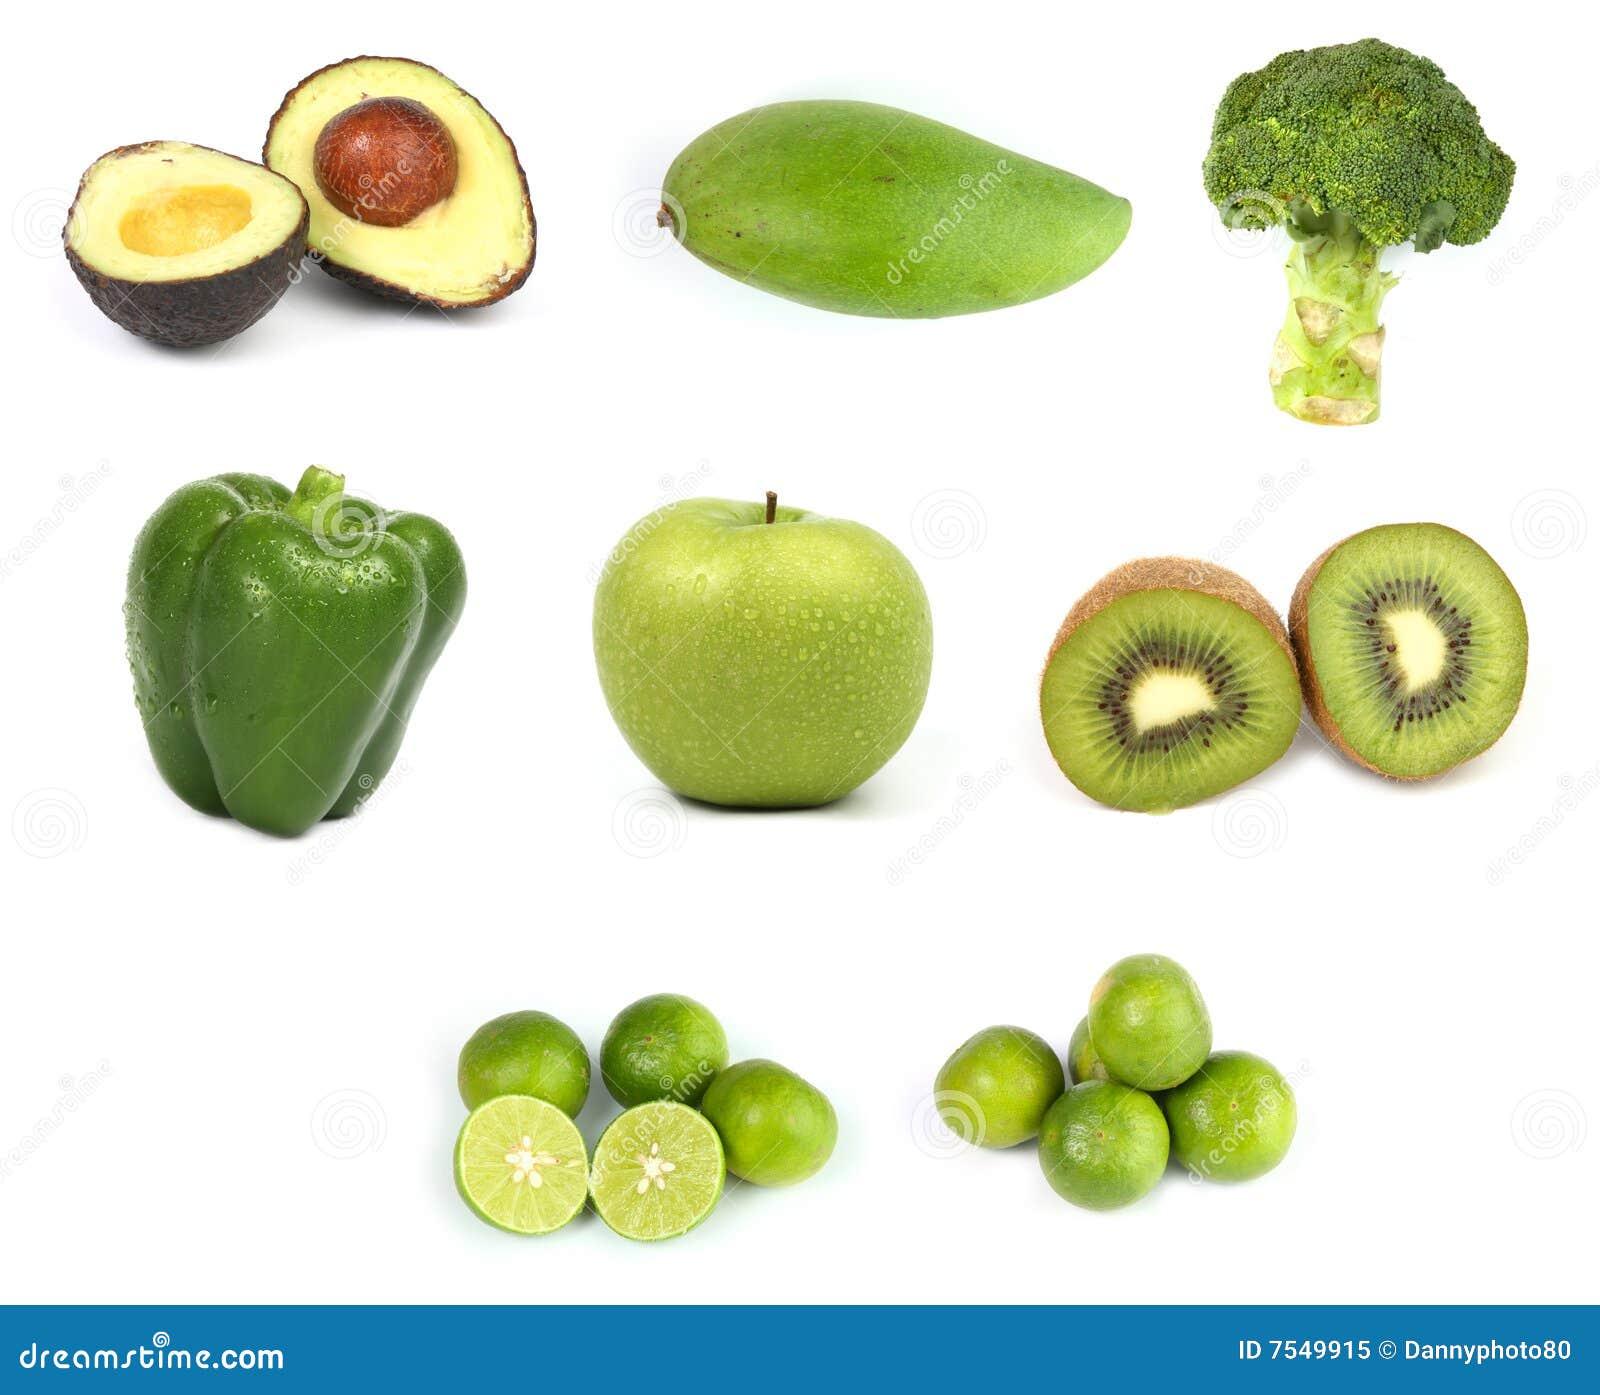 names of fruits green fruit